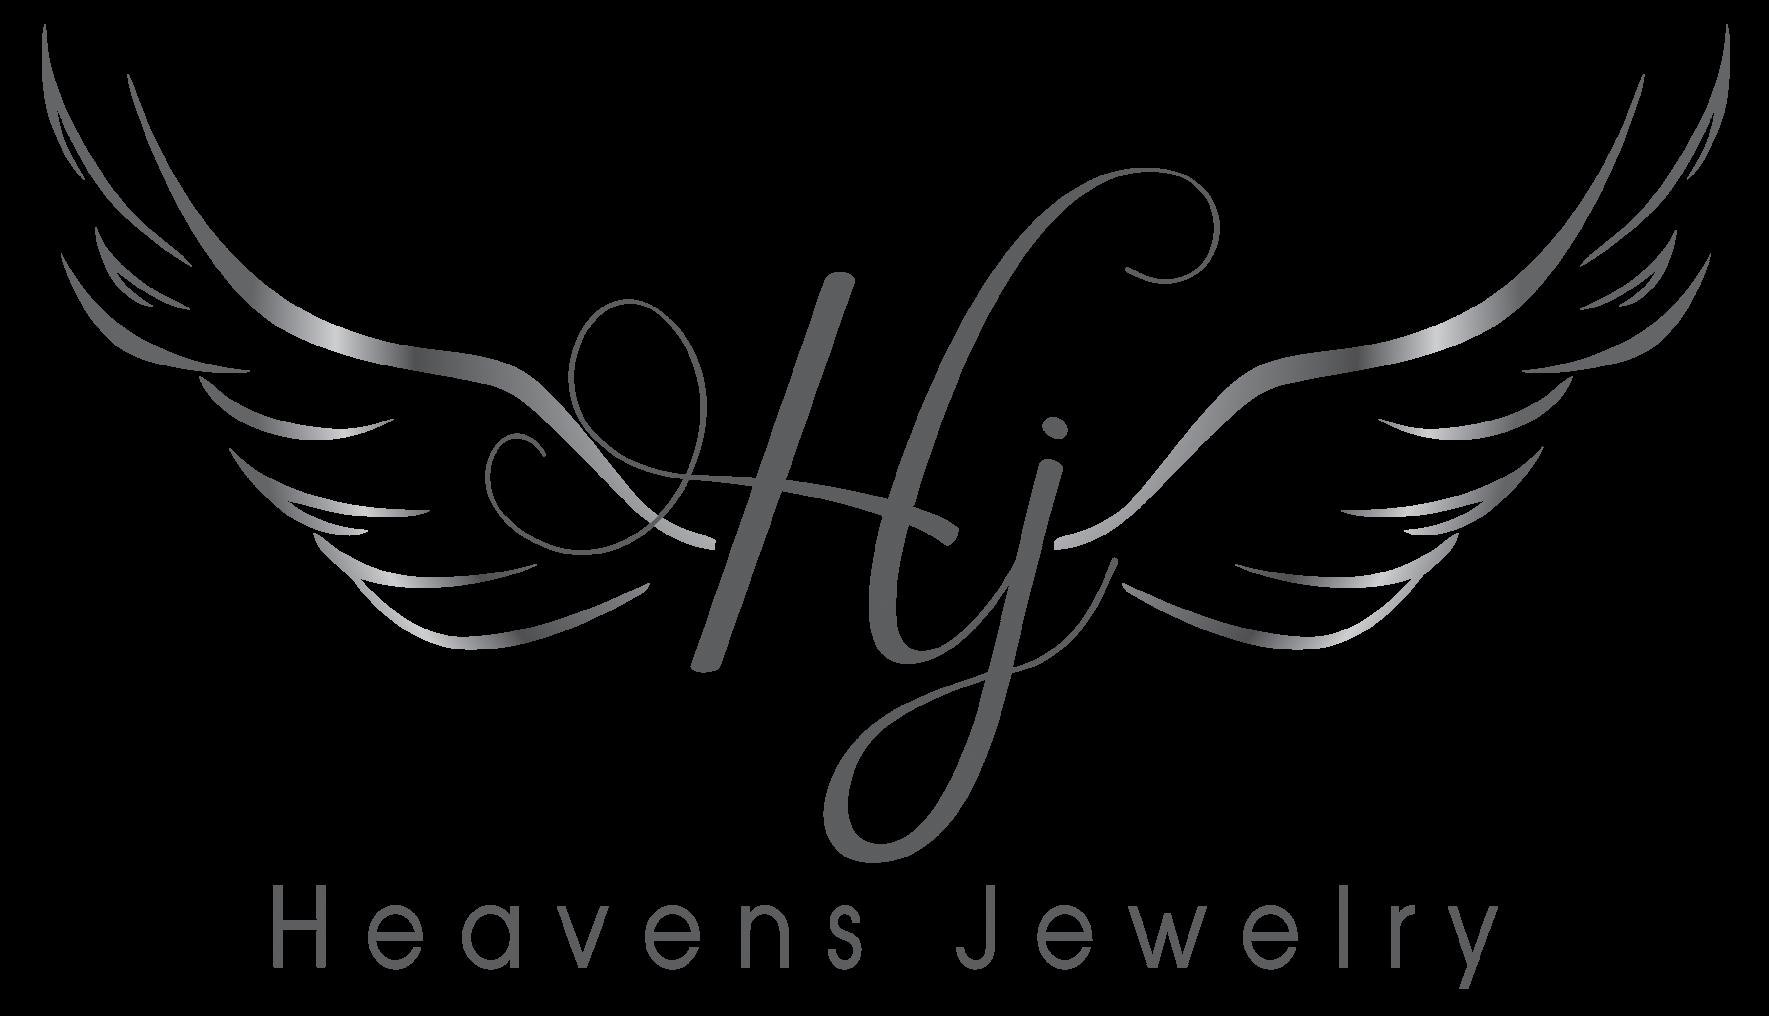 Heavens Jewelry